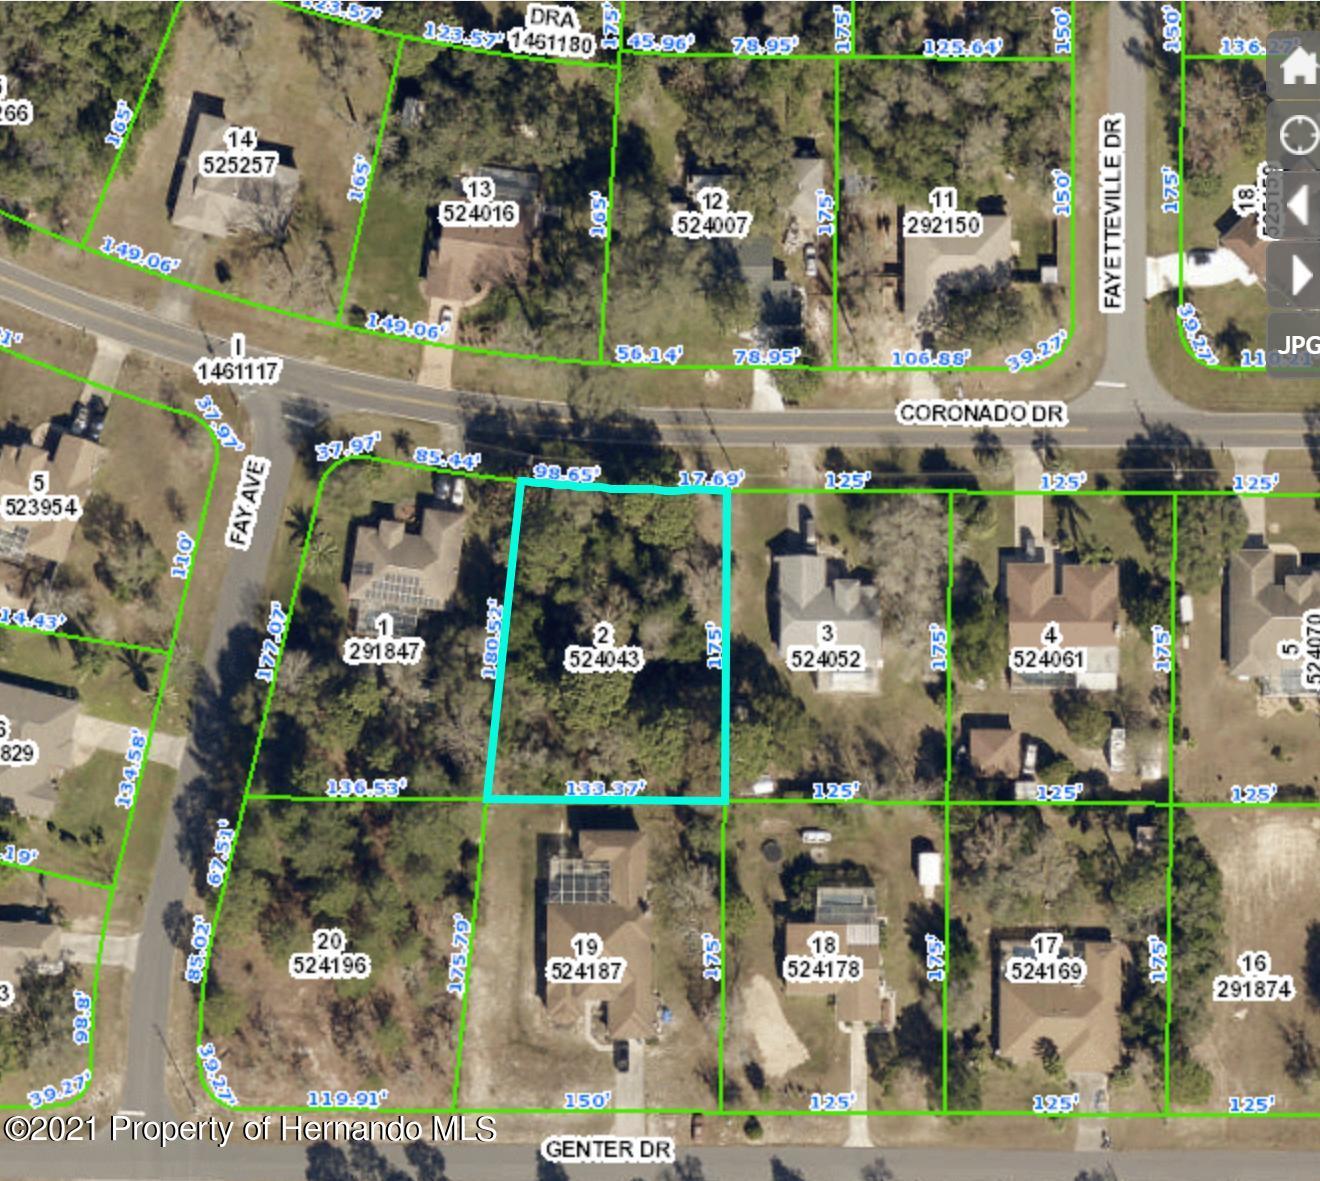 Details for 0 Coronado Drive, Spring Hill, FL 34609